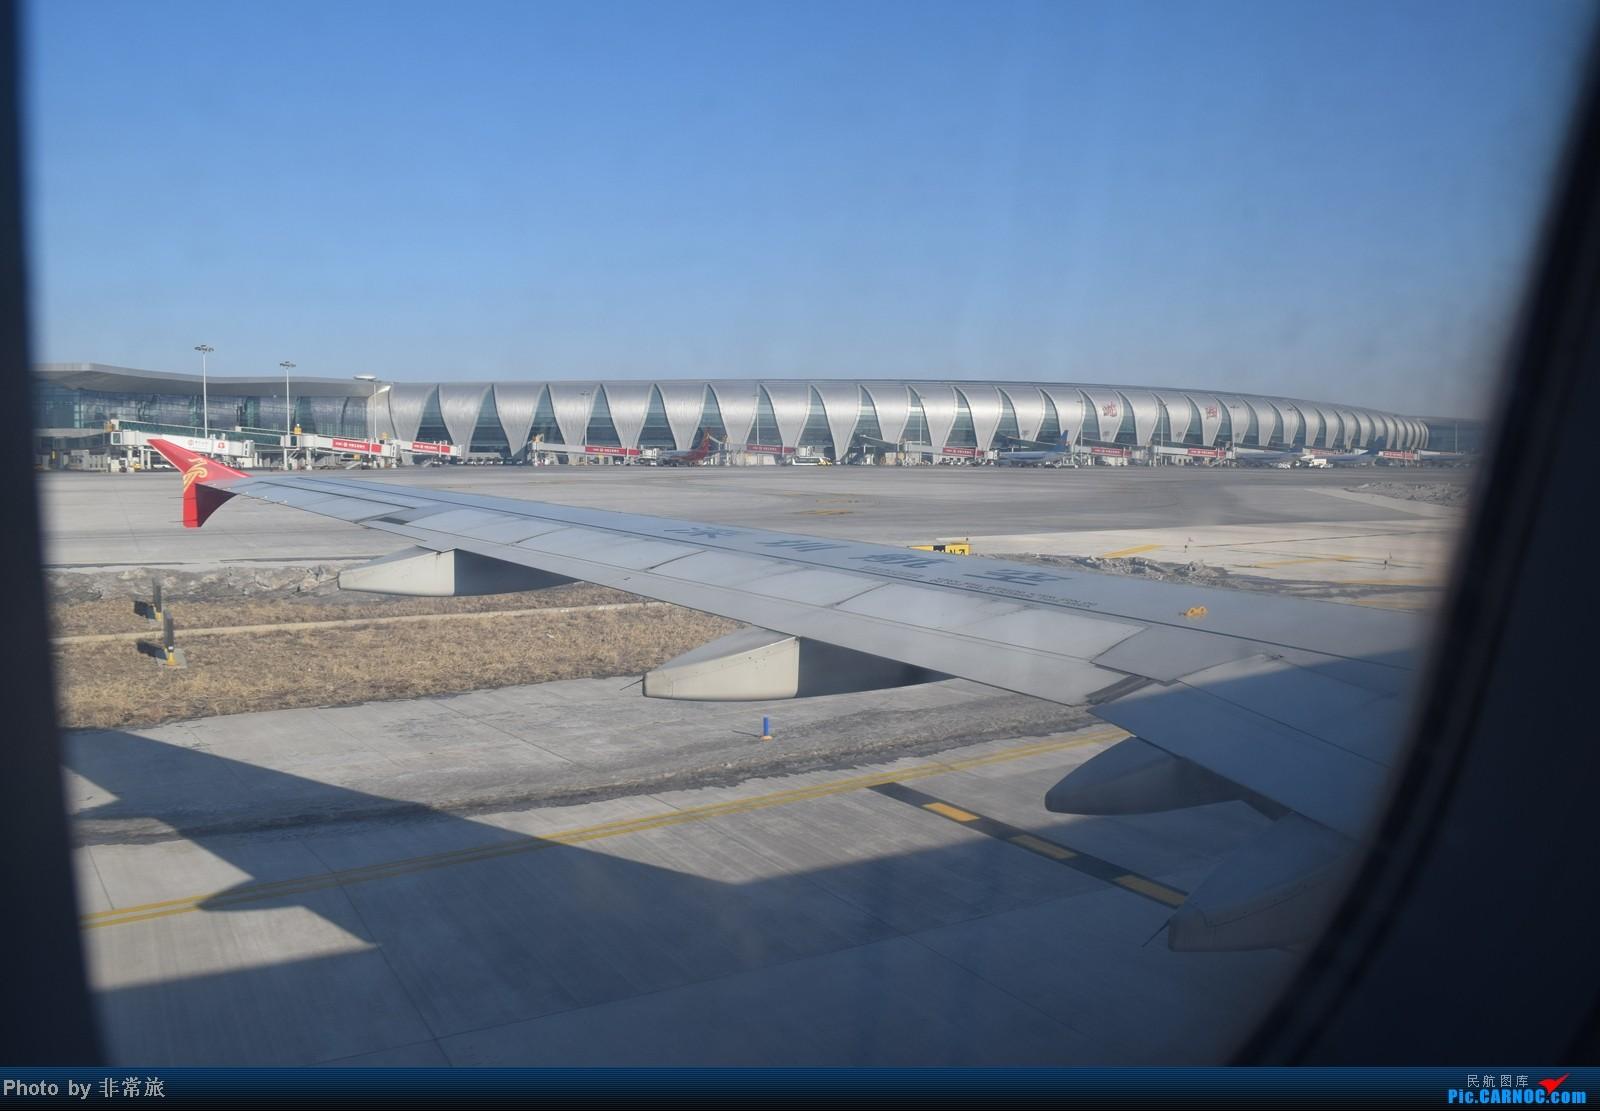 Re:[原创]大年三十除夕夜,三万英尺云霄间。 AIRBUS A320  中国沈阳桃仙机场 中国沈阳桃仙机场